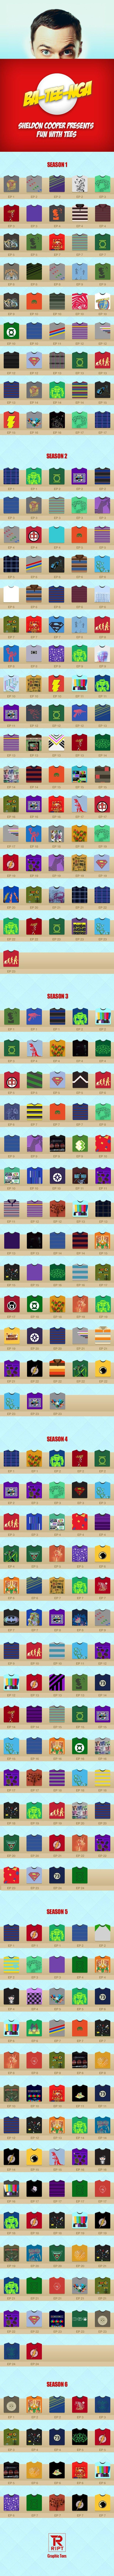 Every T-Shirt Sheldon Cooper Has Ever Worn! – Infographic